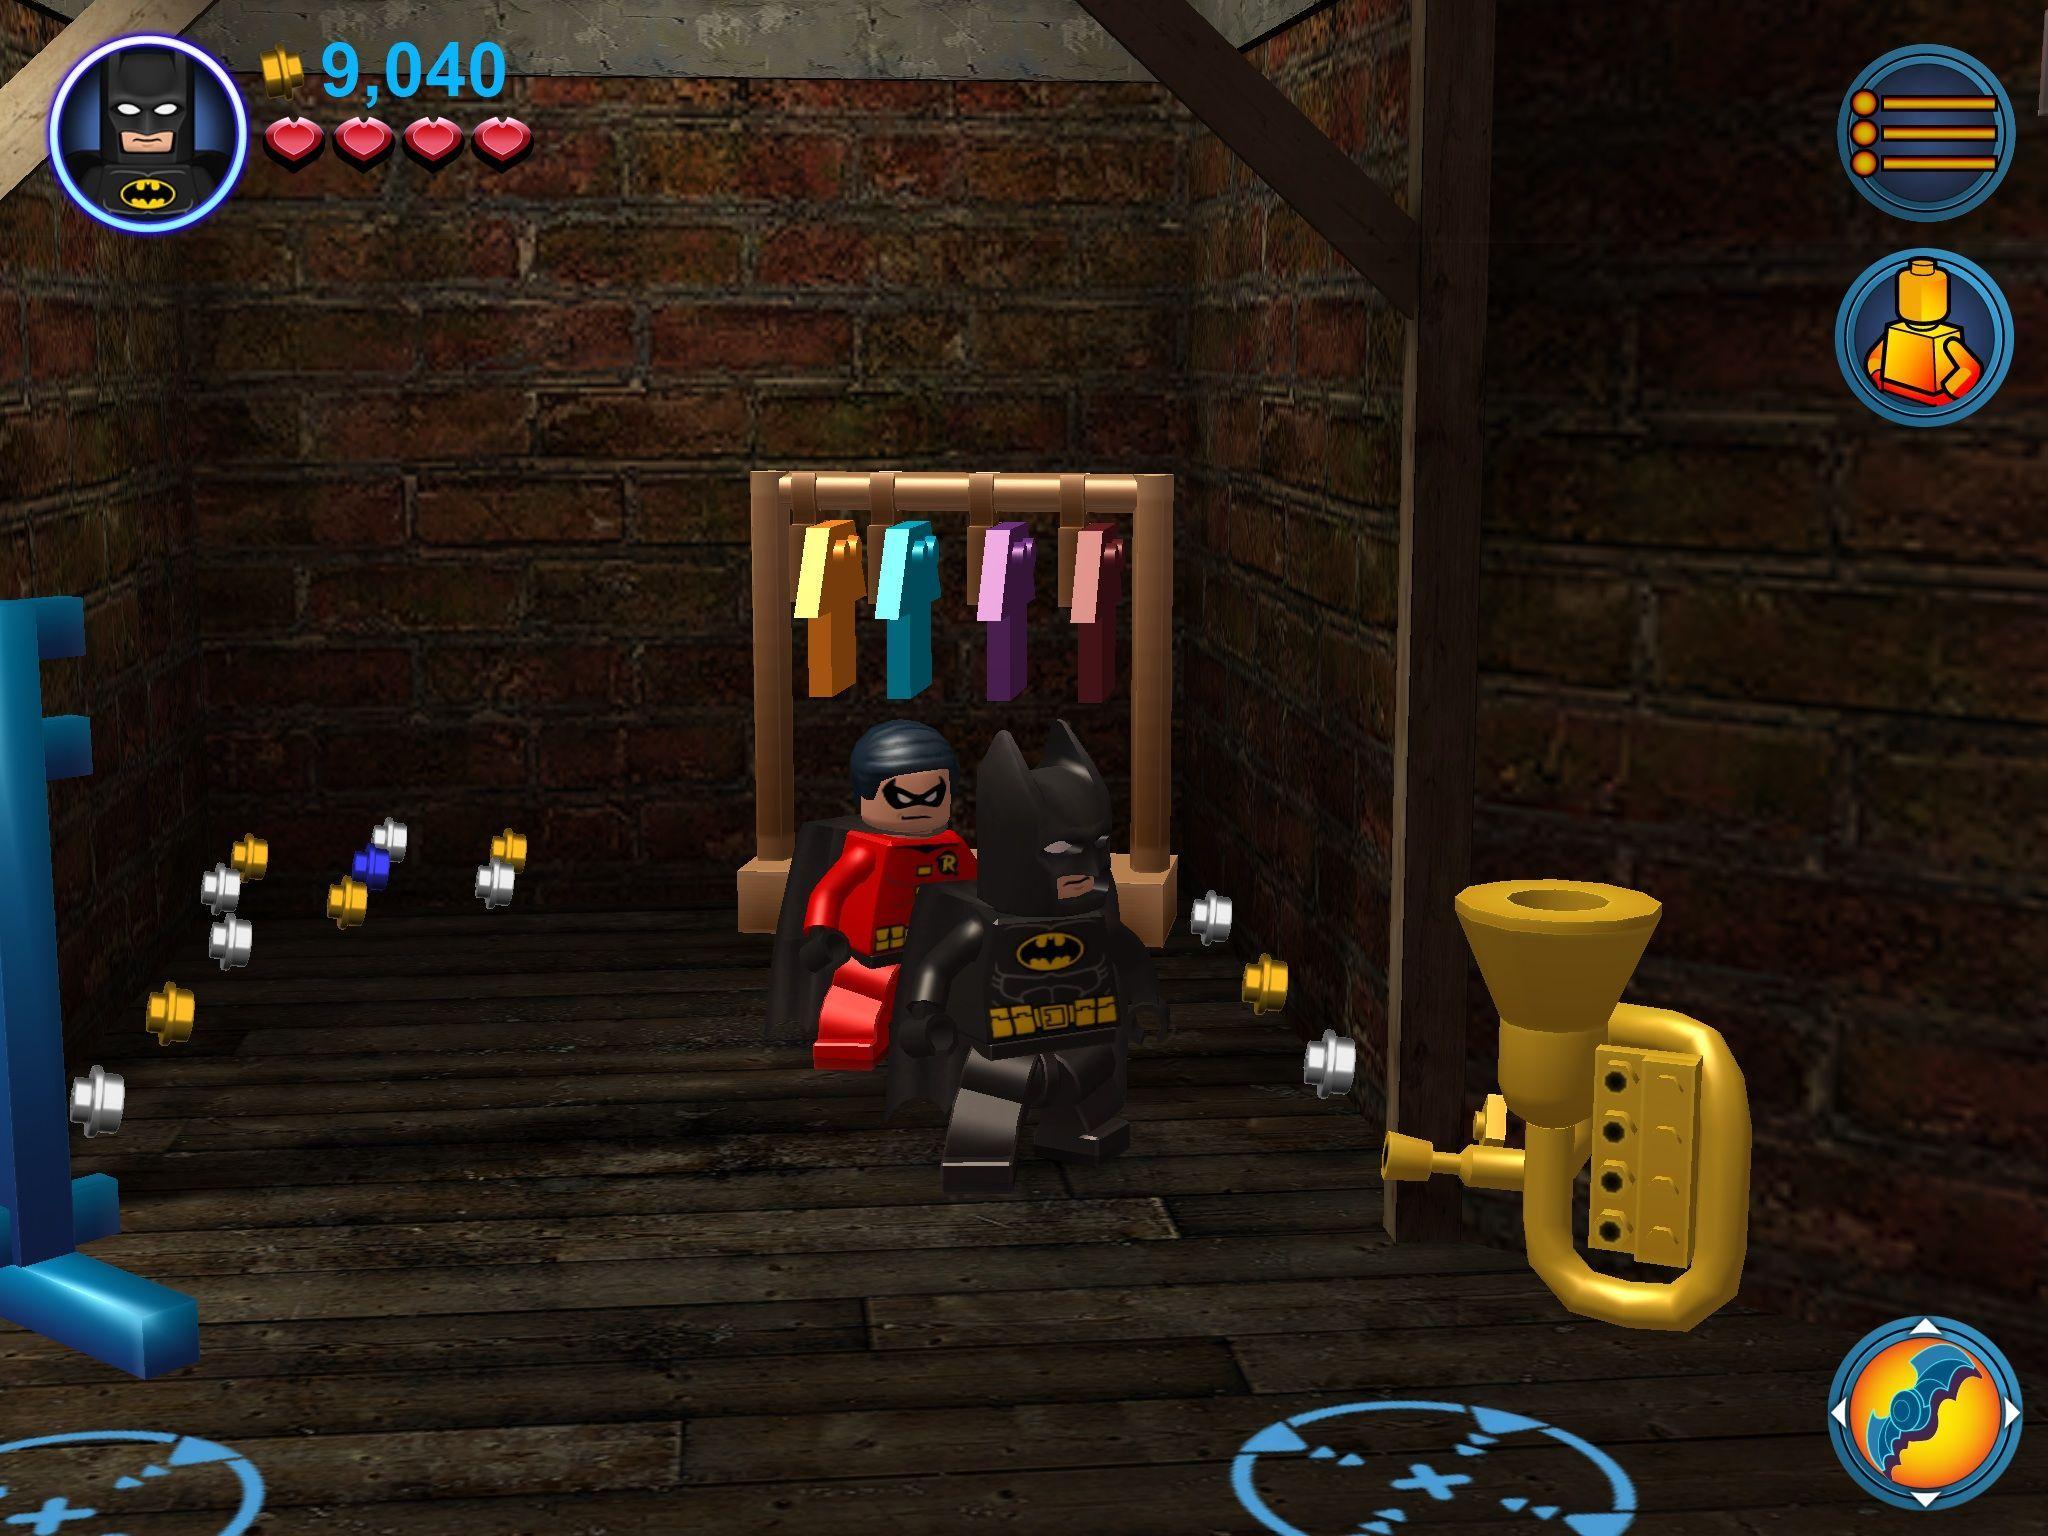 скачать лего бэтмен 2 на андроид